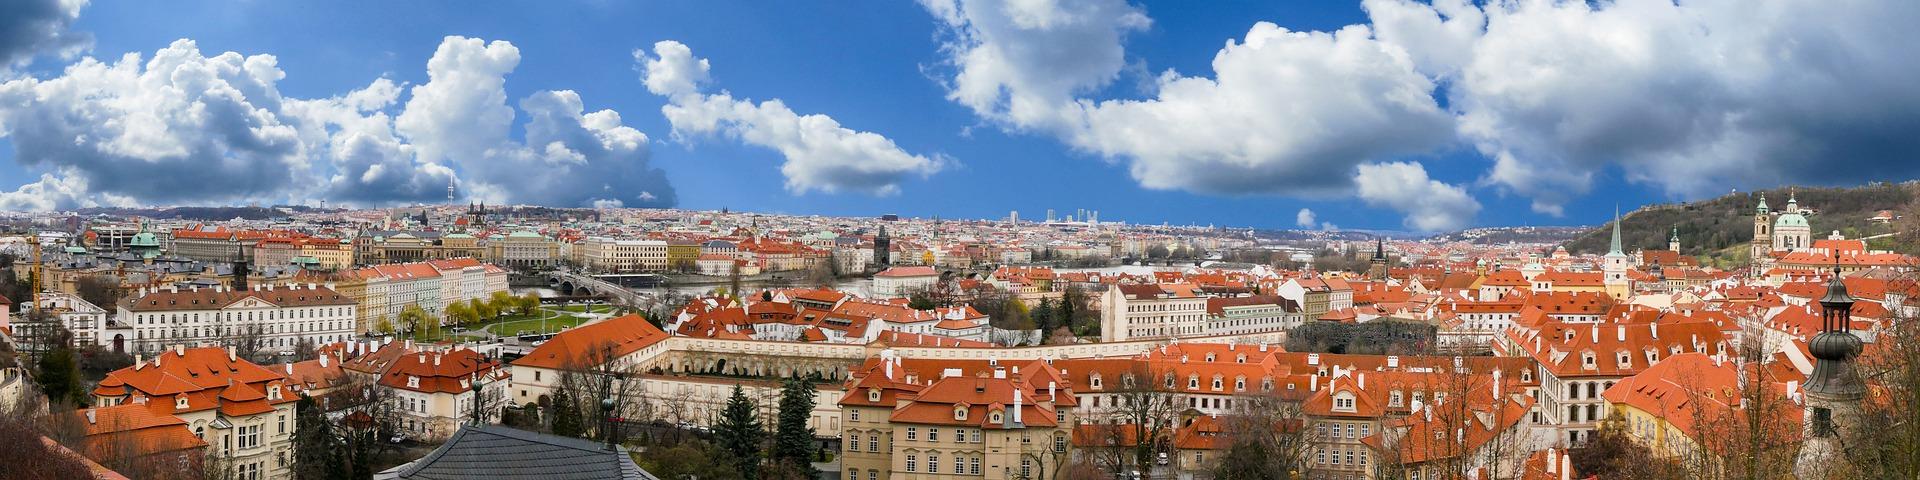 Poland and the Czech Republic: UNESCO sites & Jewish Heritage